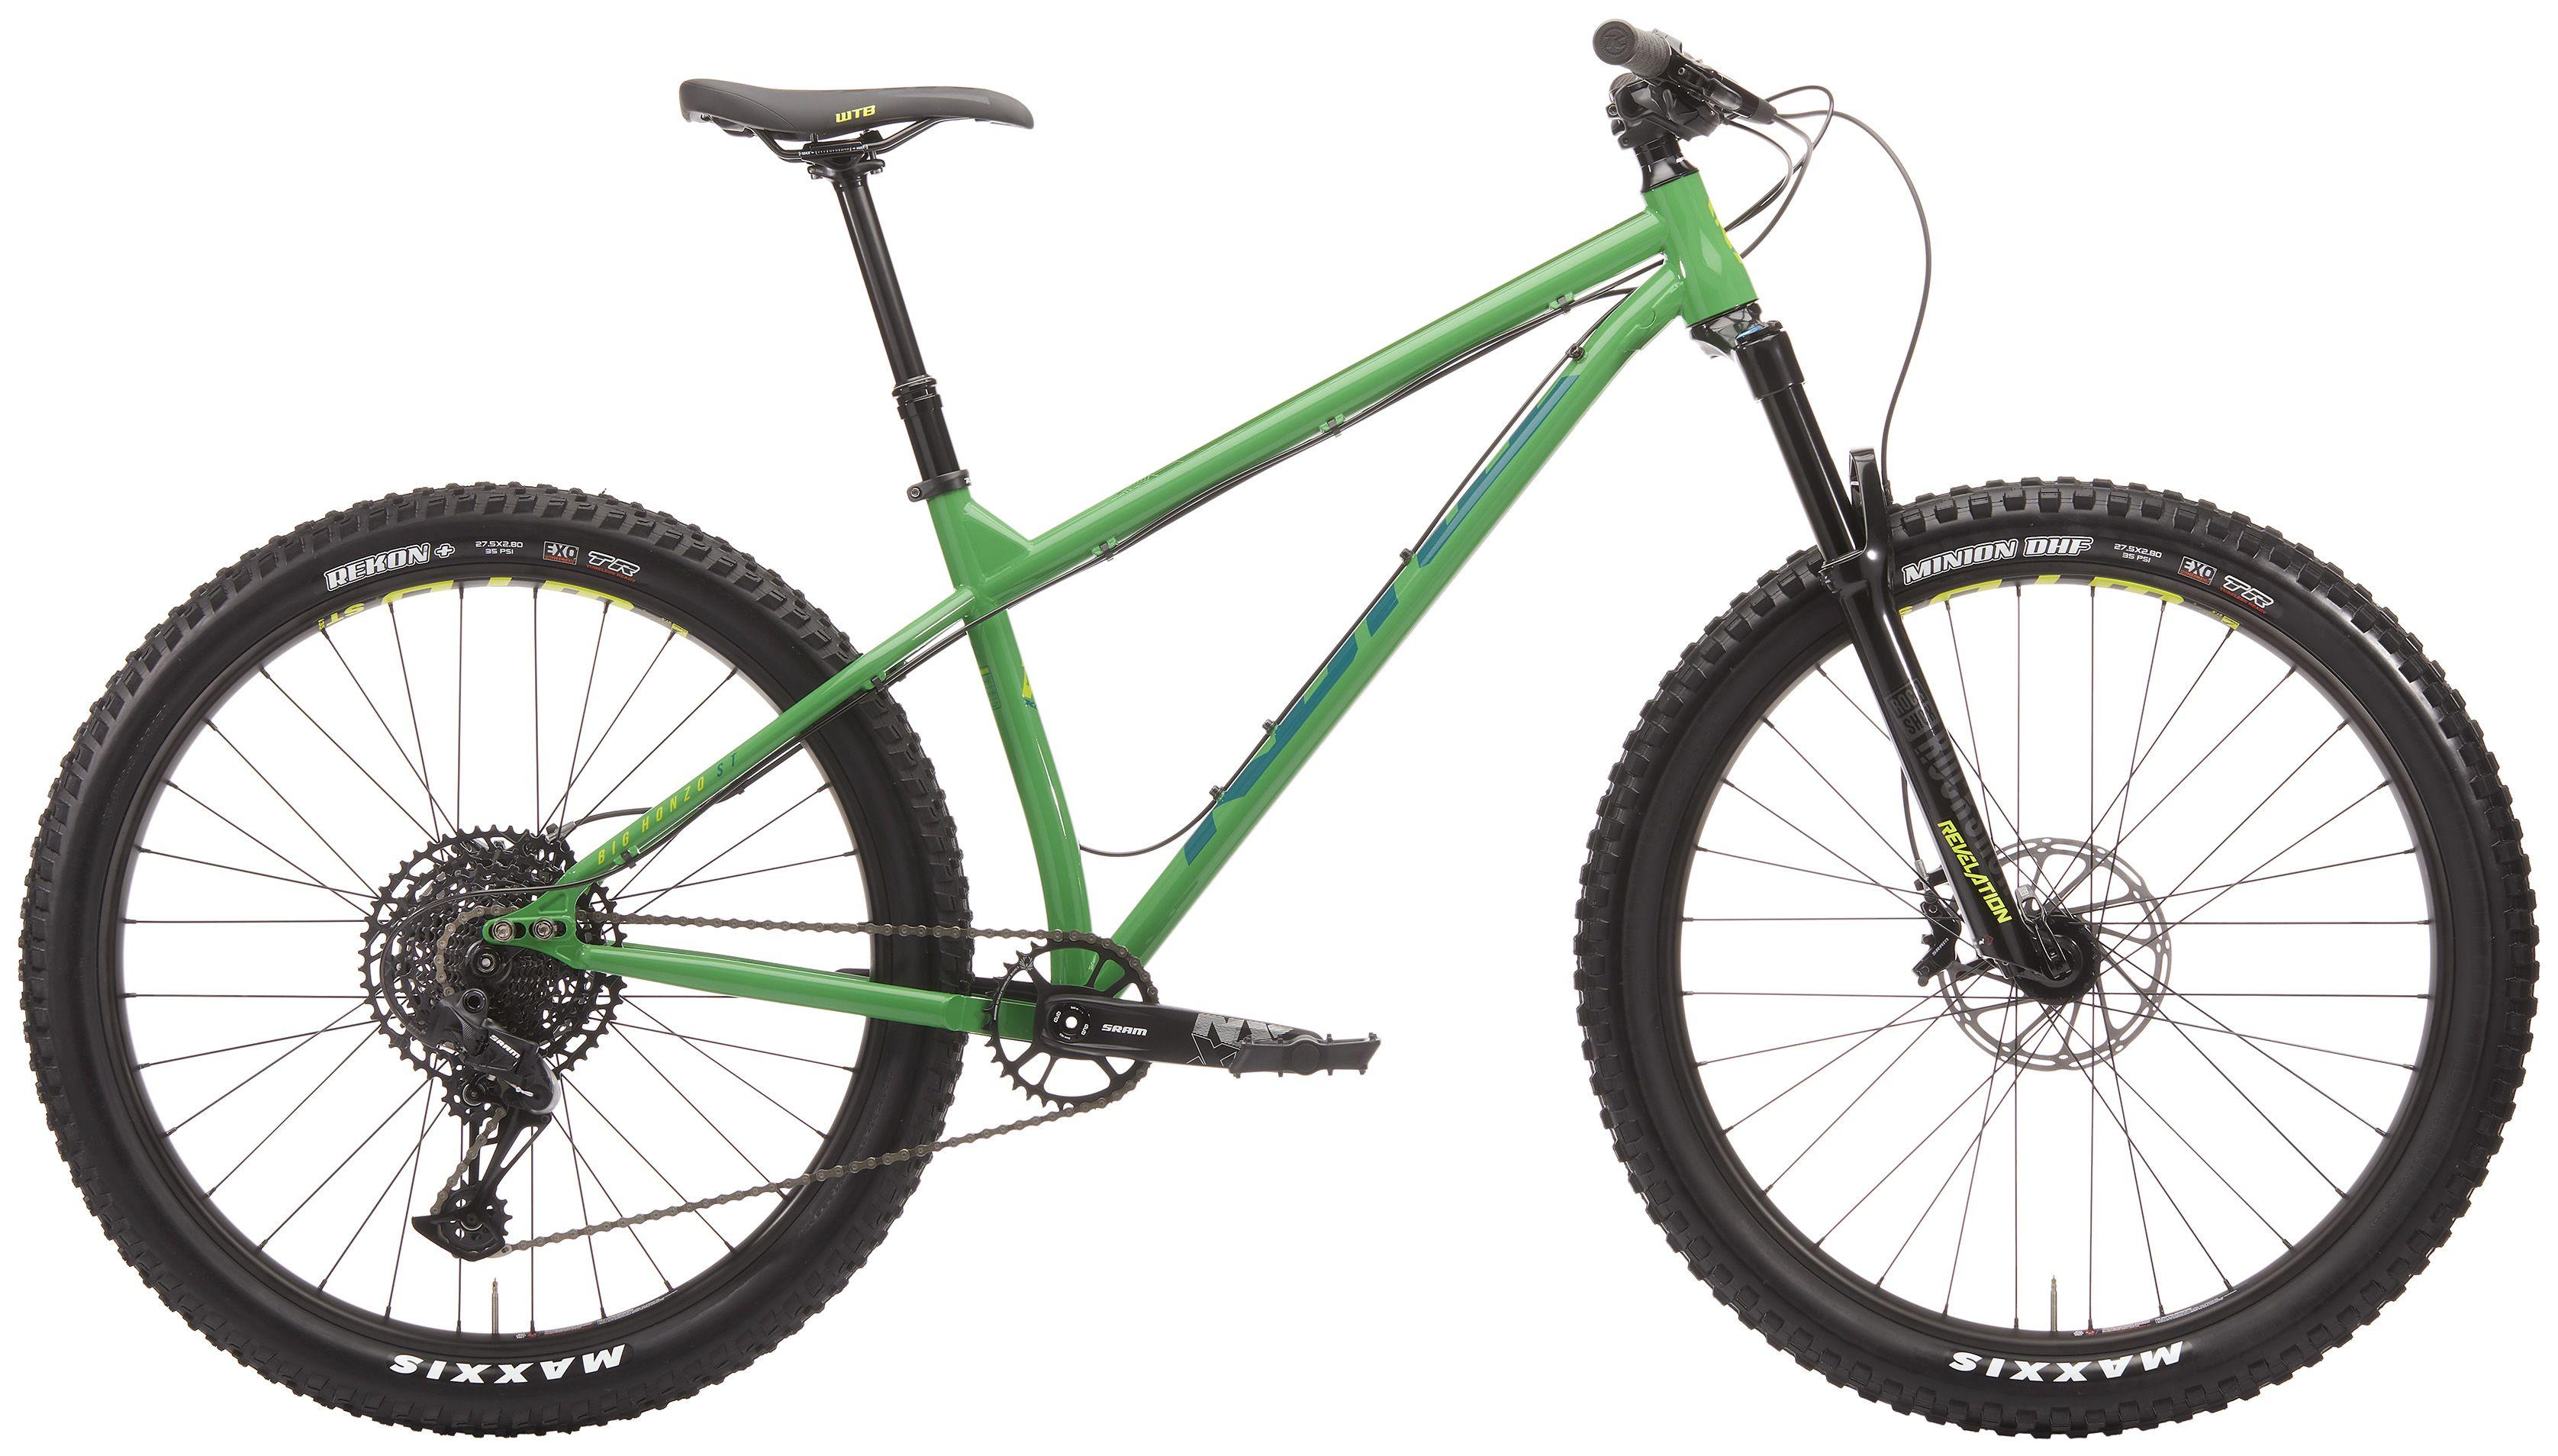 Kona Big Honzo St 650b Mountain Bike 2020 | Mountainbikes